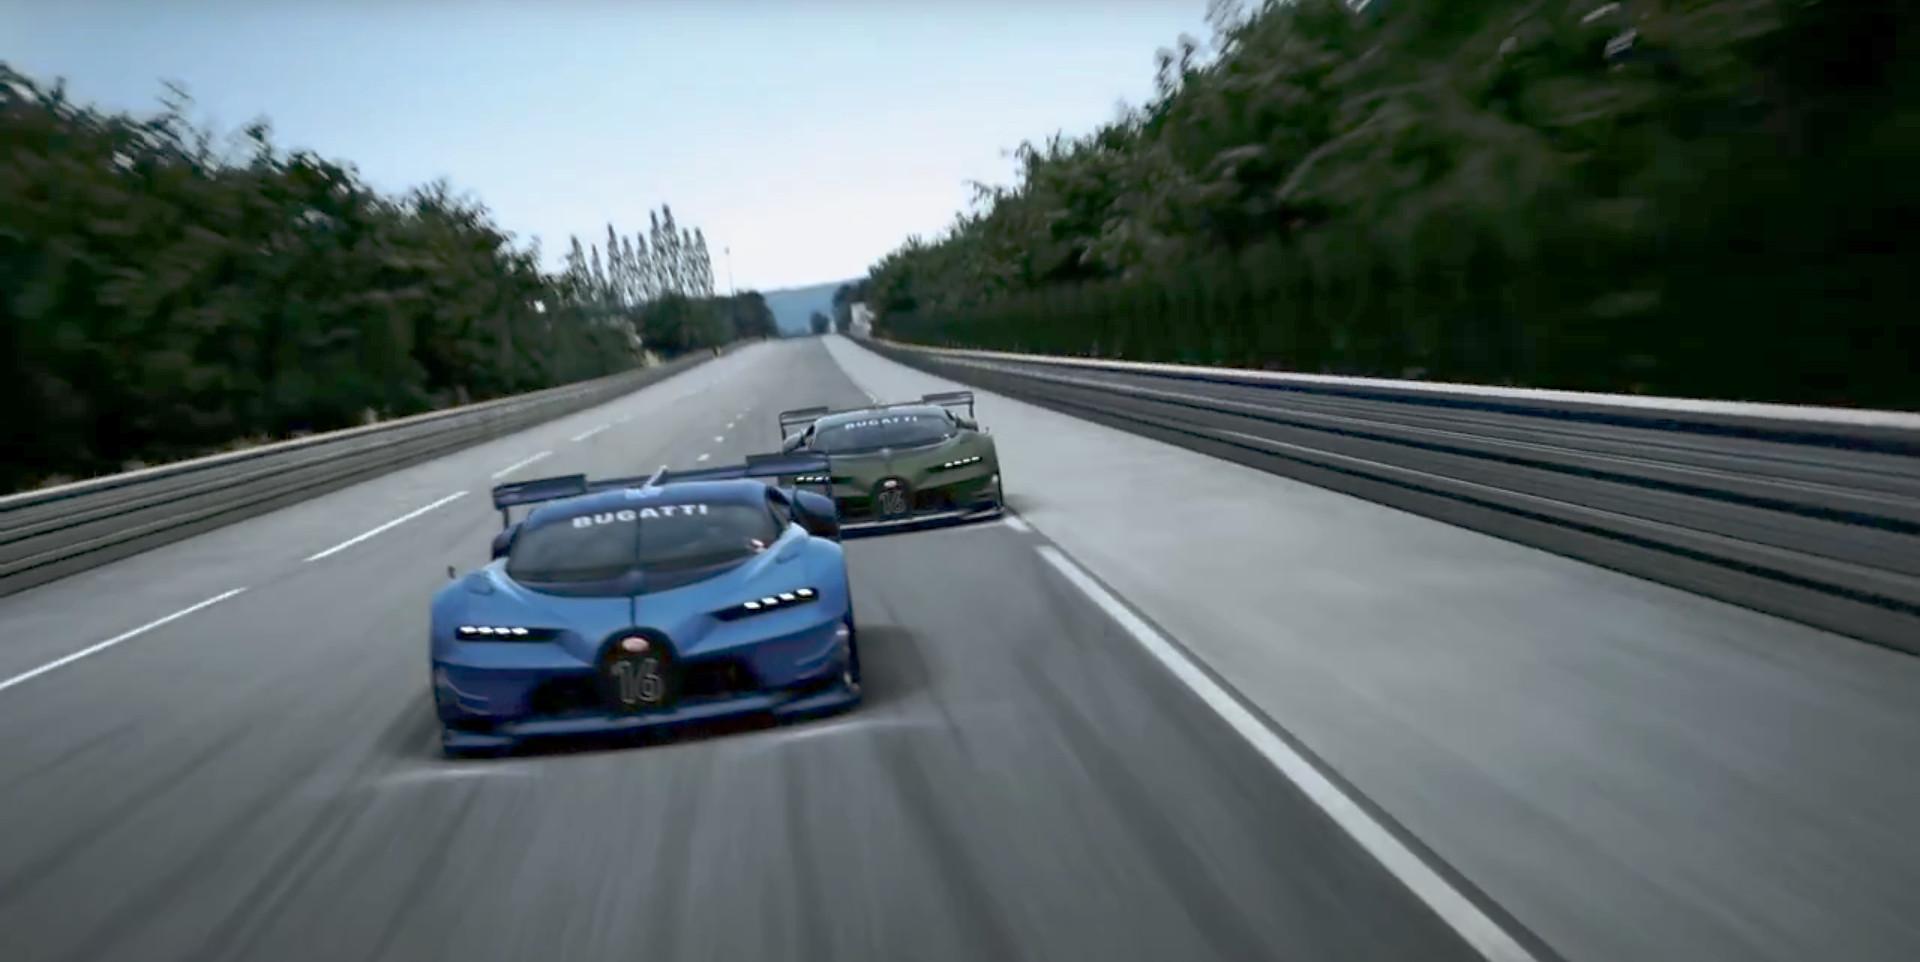 Designing The Bugatti Vision GT Video Motrolix